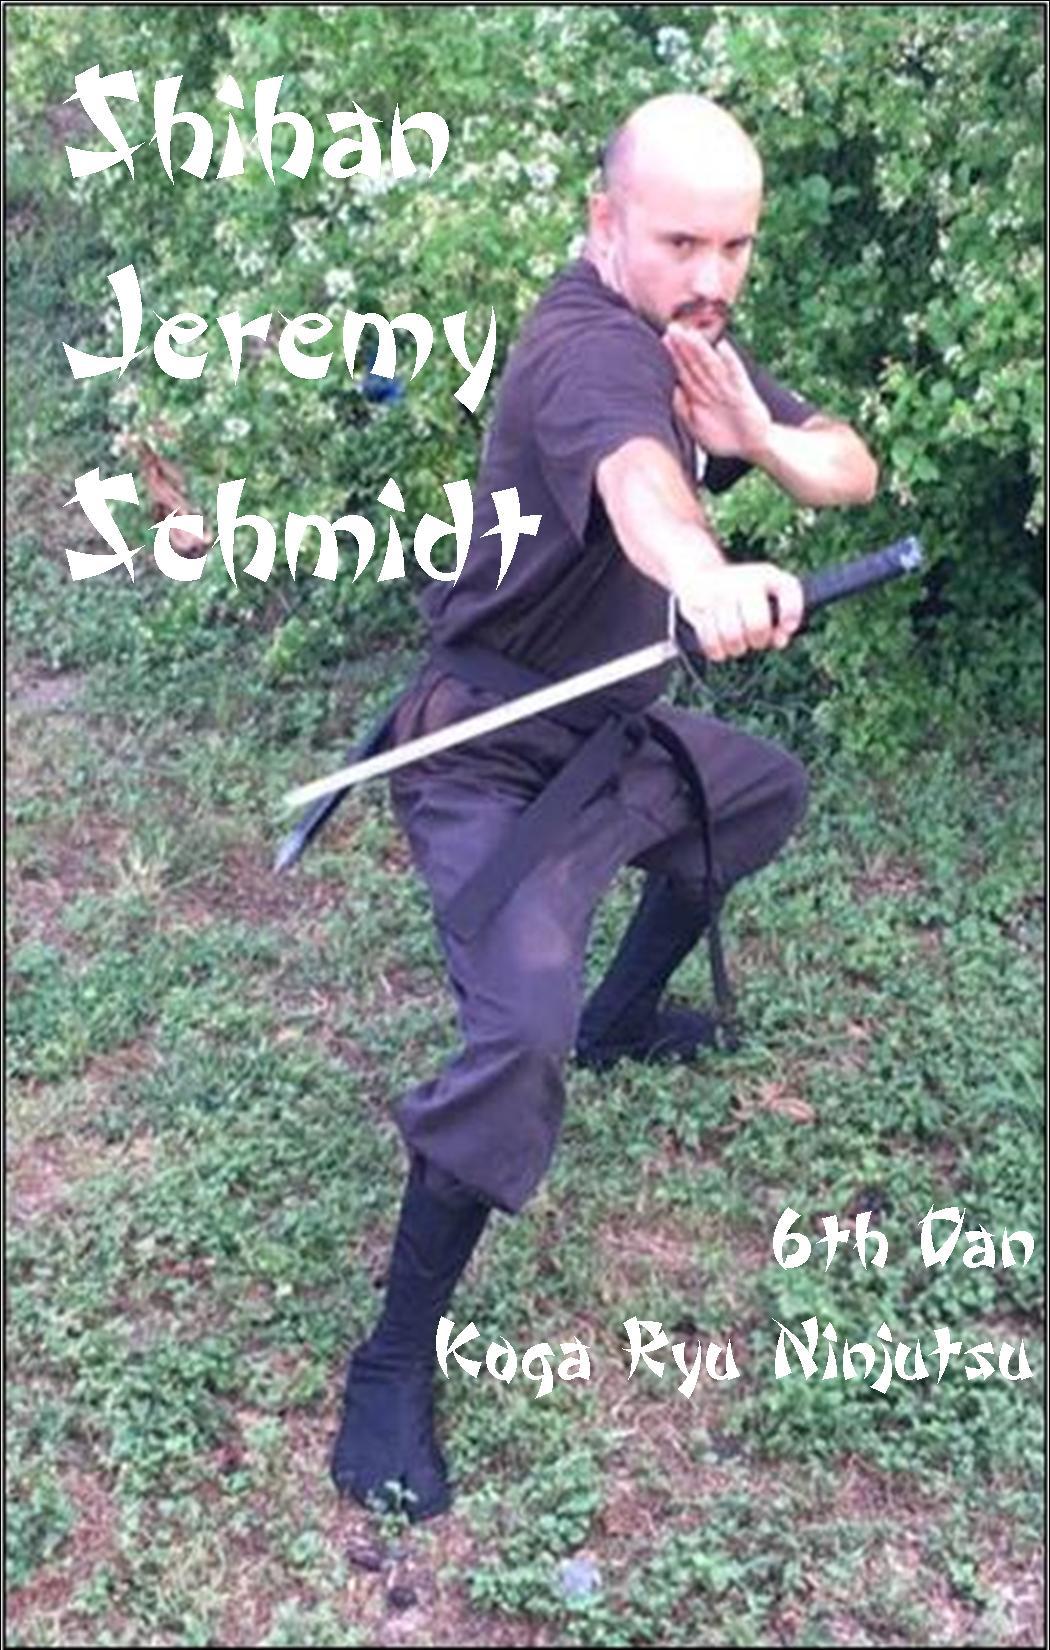 Shihan Jeremy Schmidt